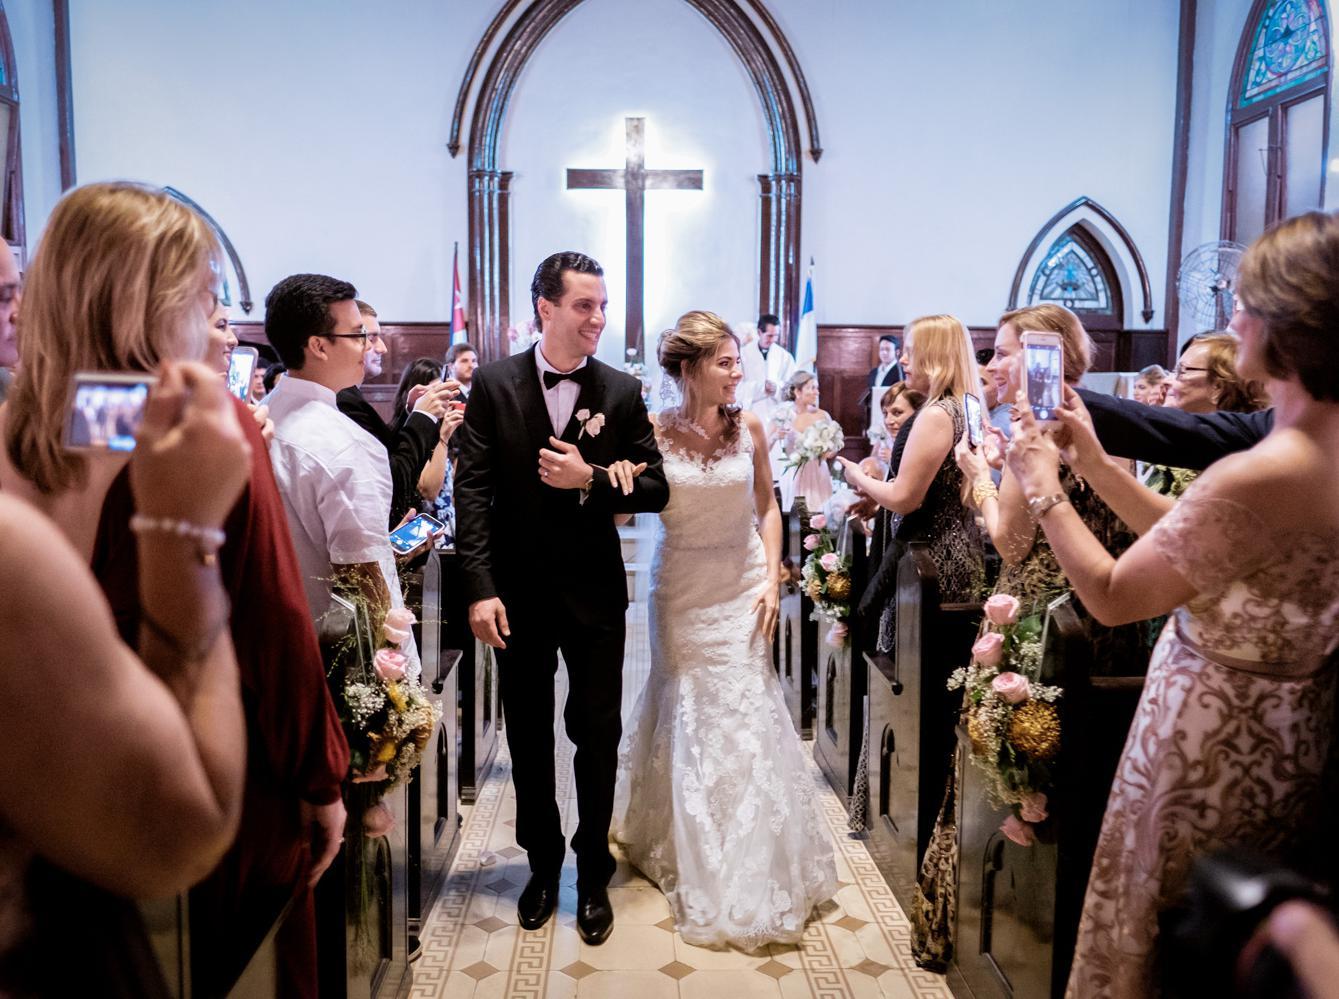 bodas-sin-clasificar-sin-tema-cuba-27622.jpg